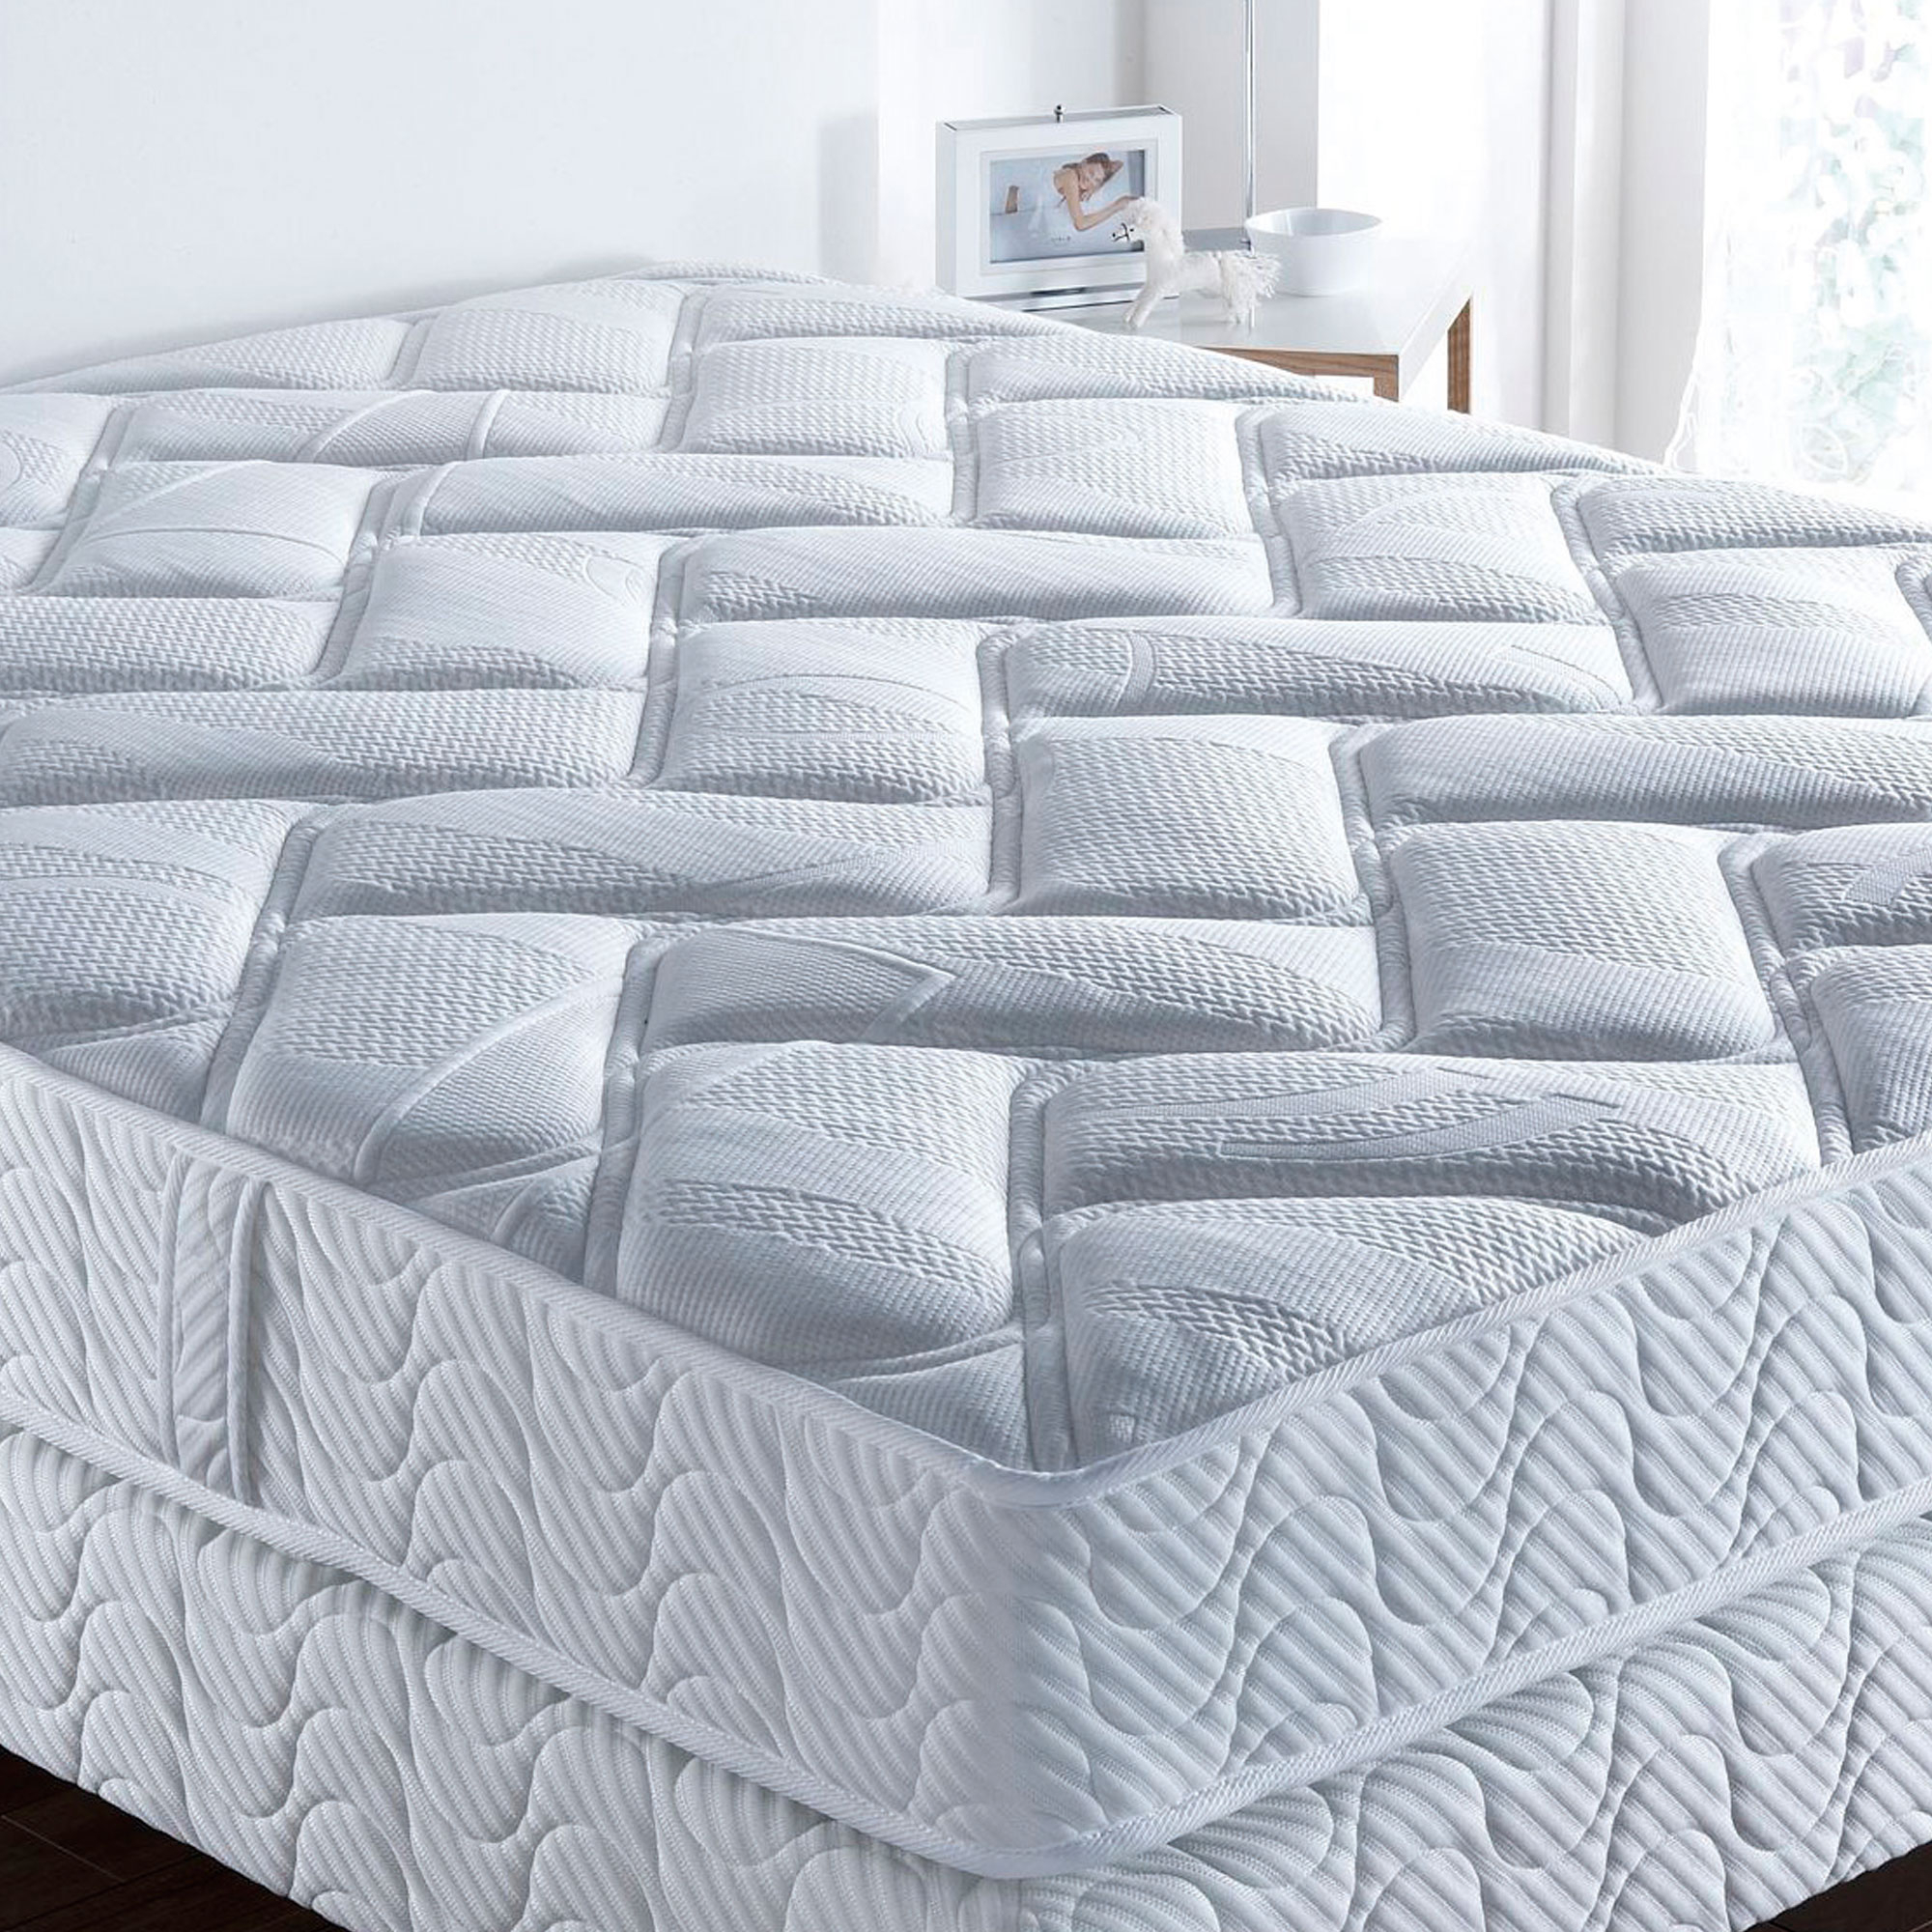 bultex matelas mousse 2 personnes 140 x 190 cm desirade. Black Bedroom Furniture Sets. Home Design Ideas